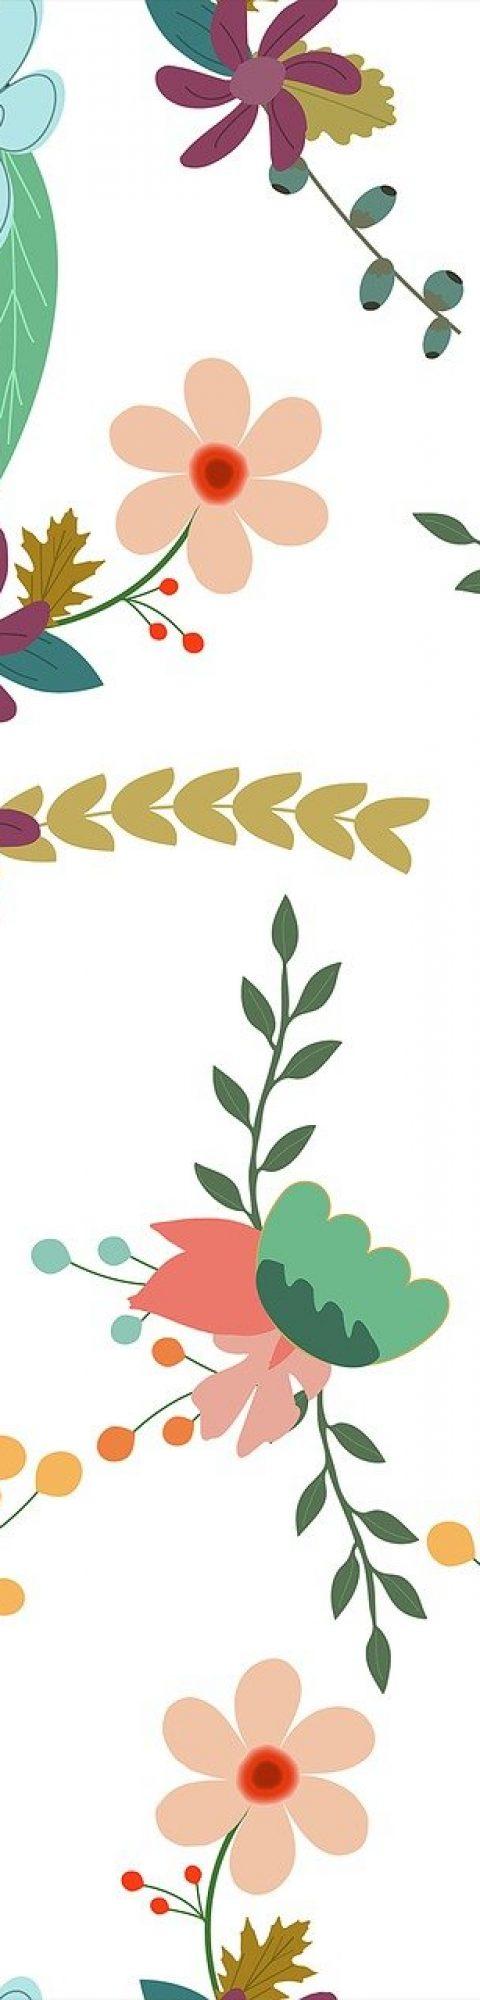 floral-2985648_1280